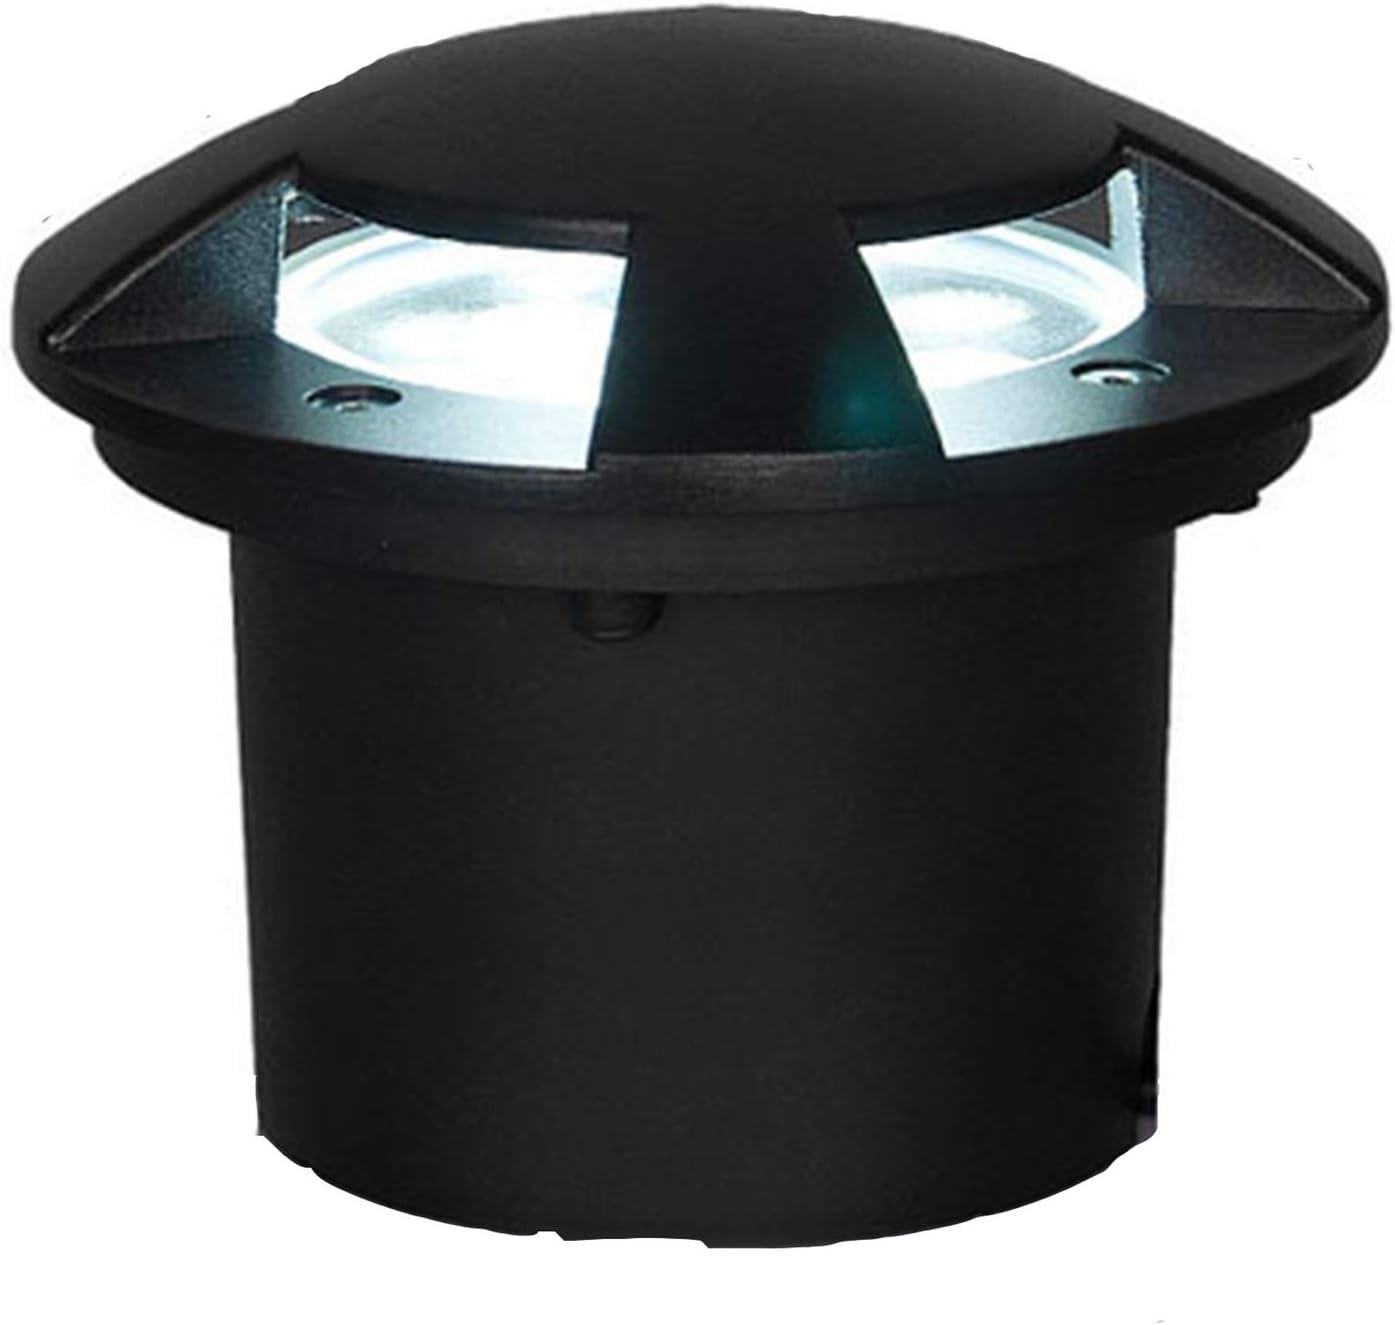 GHHZZQ LED Underground Light Waterproof Luminous Classic IP66 Max 60% OFF Sid All On